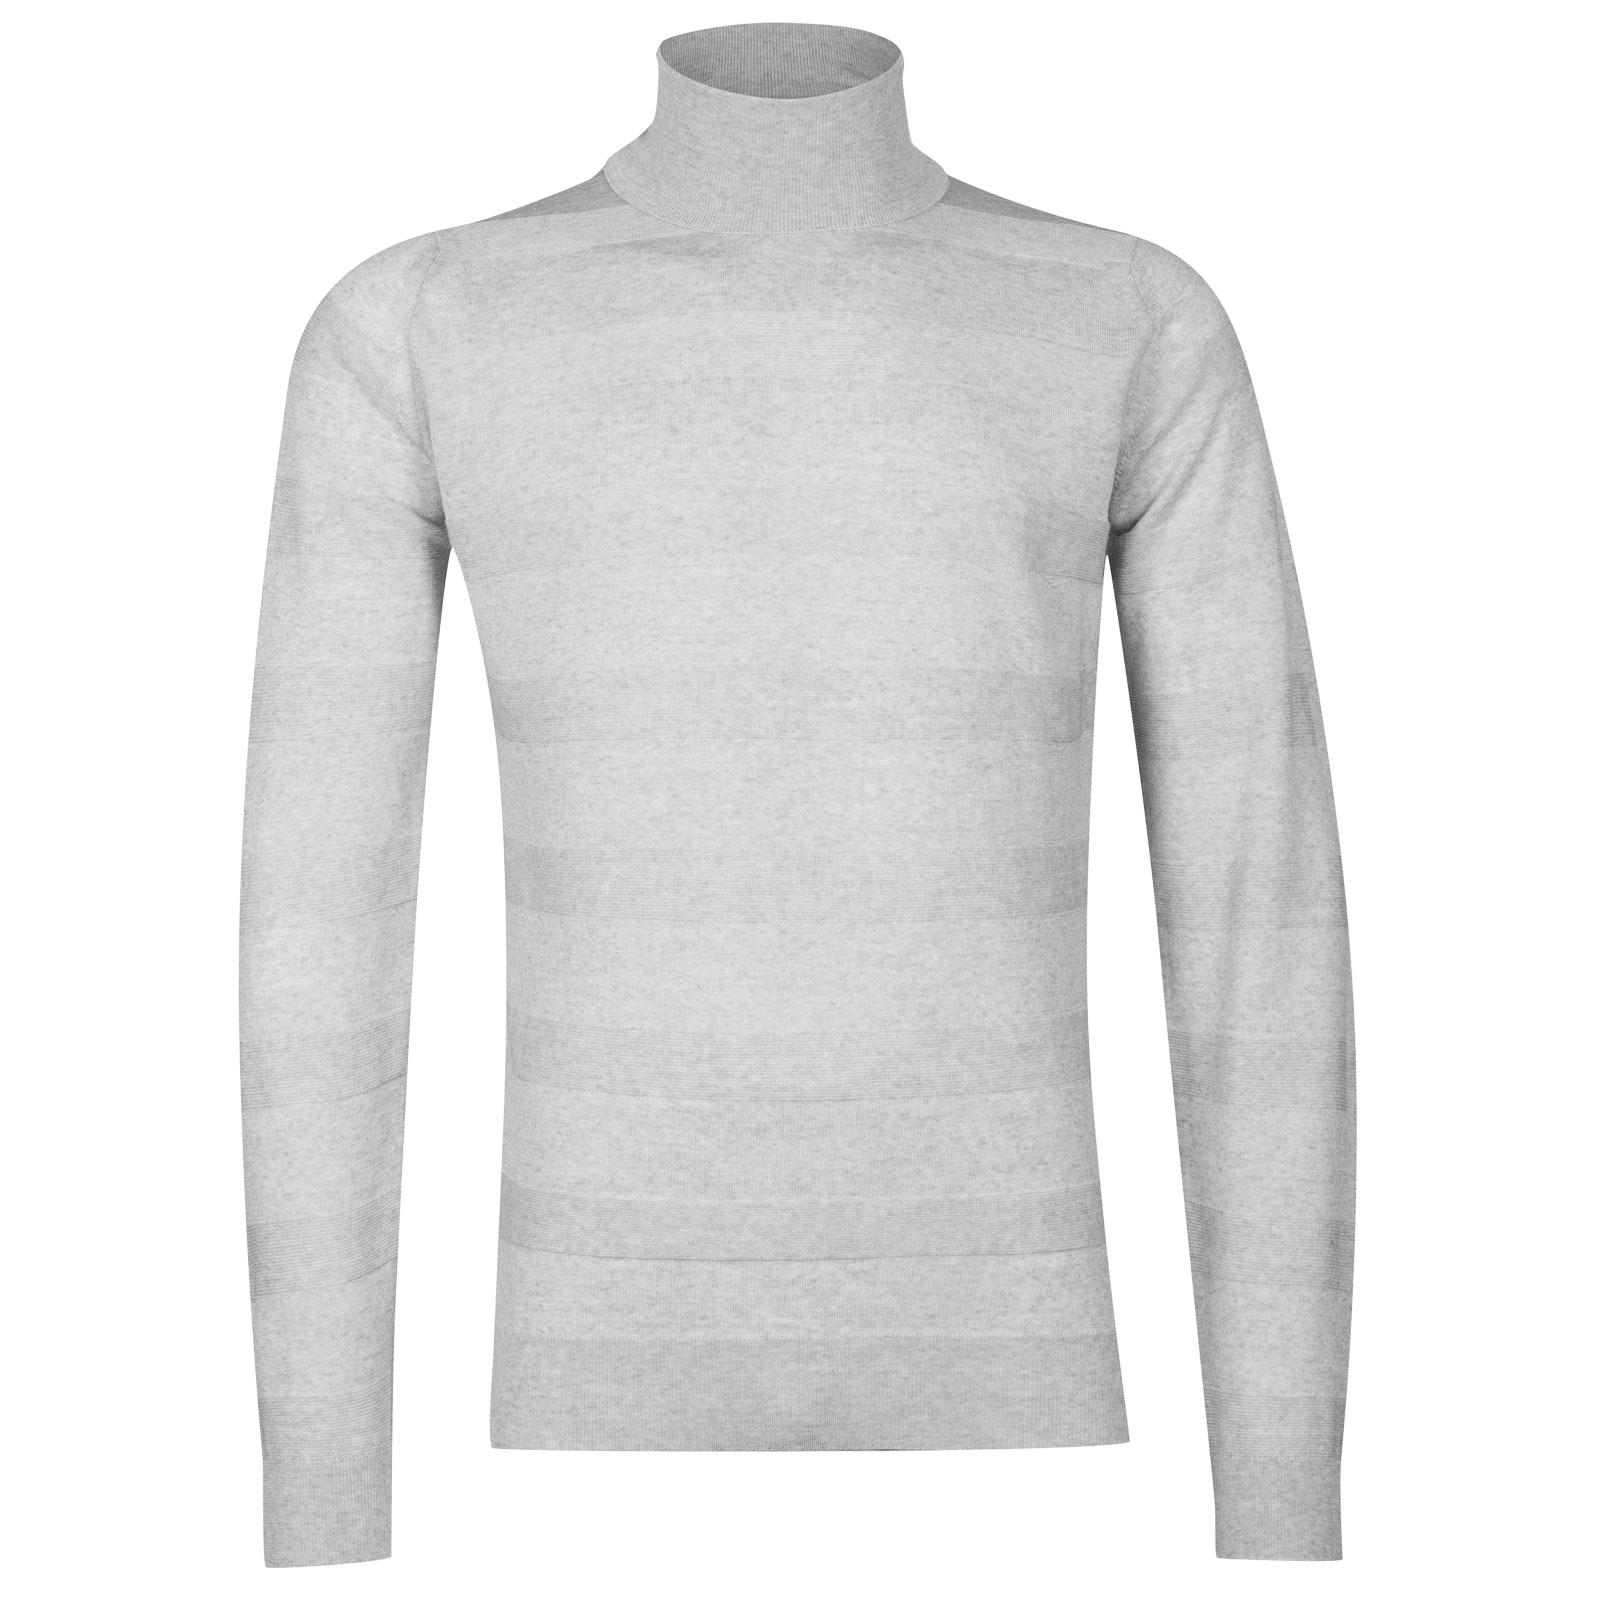 John Smedley ripley Merino Wool Pullover in Bardot Grey-XXL